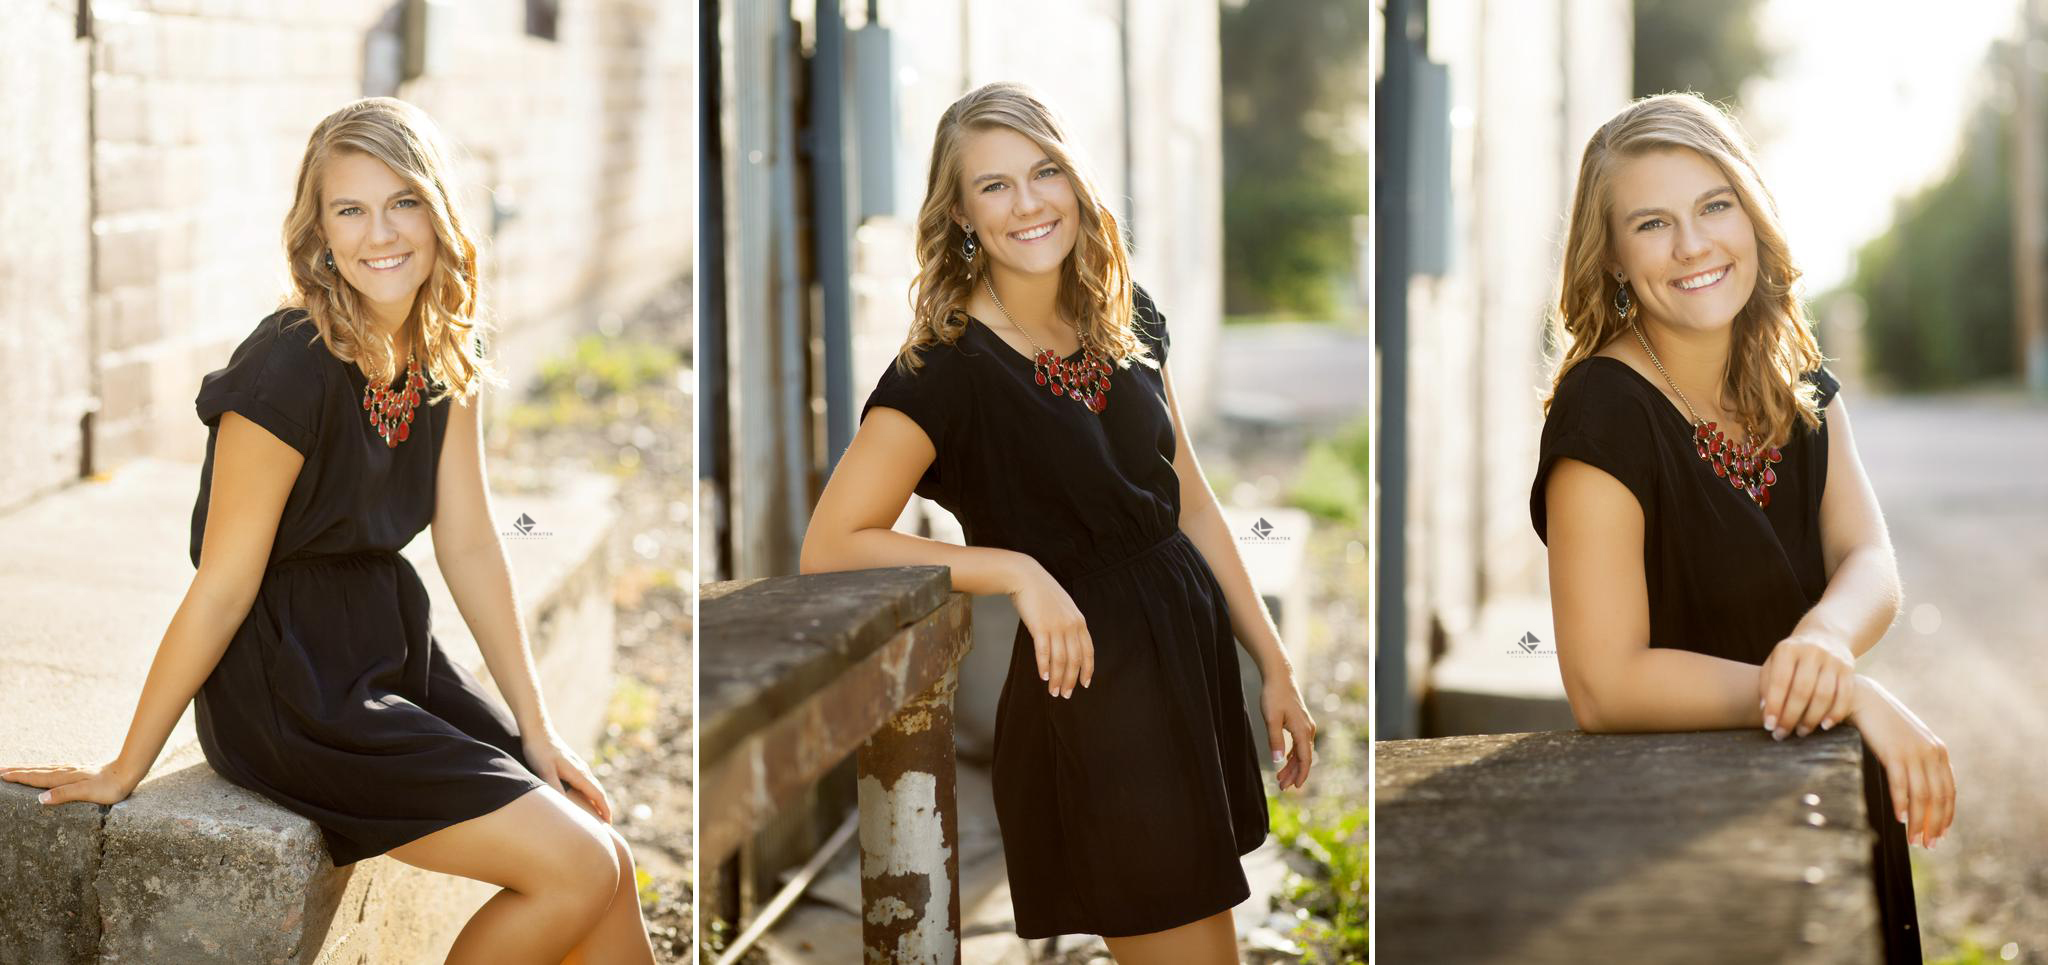 blonde senior girl in a black dress in an urban alleyway